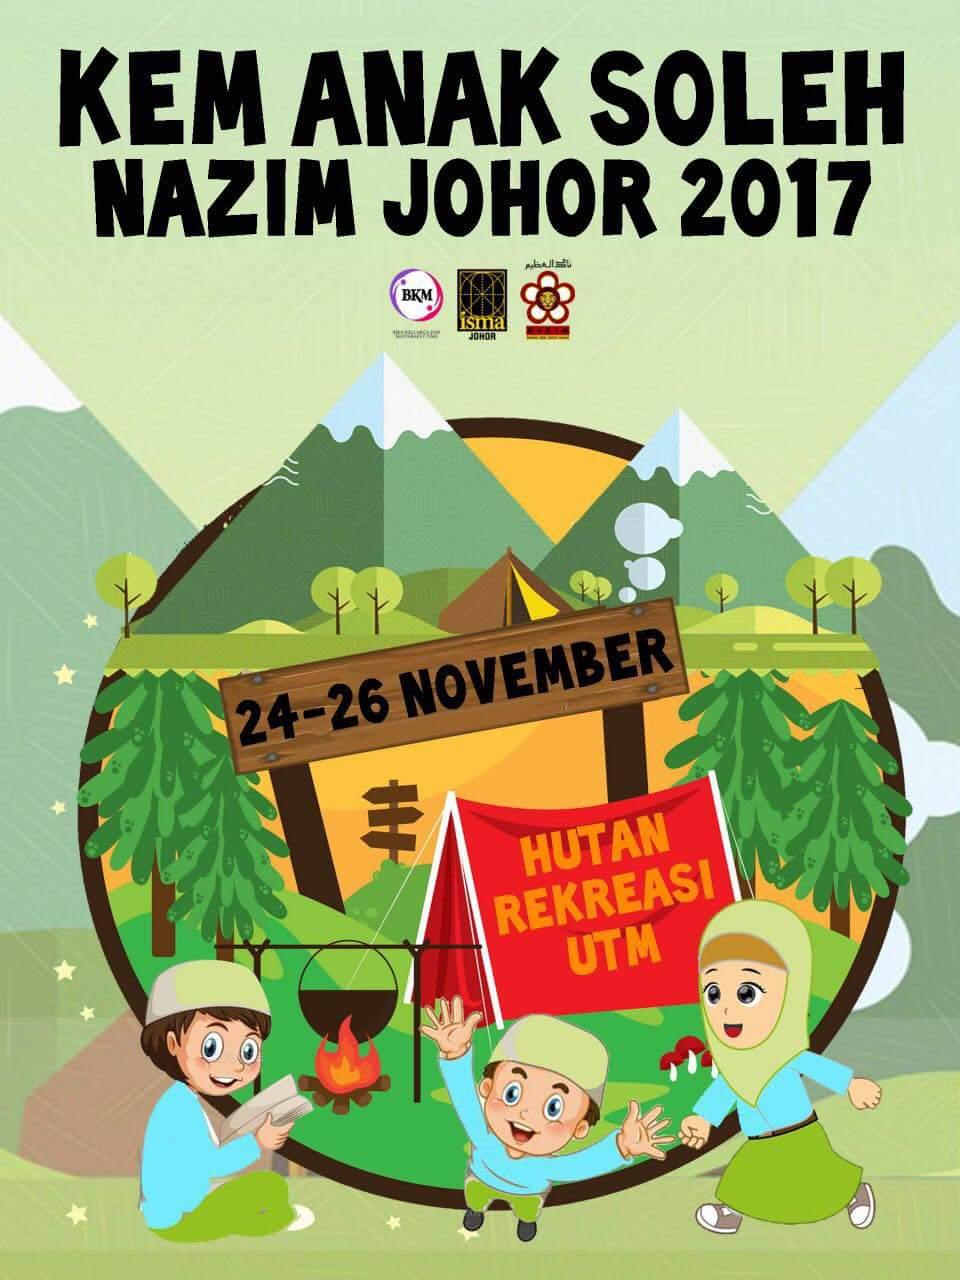 Kem Anak Soleh Nazim Johor 2017 | 24 – 26 November 2017